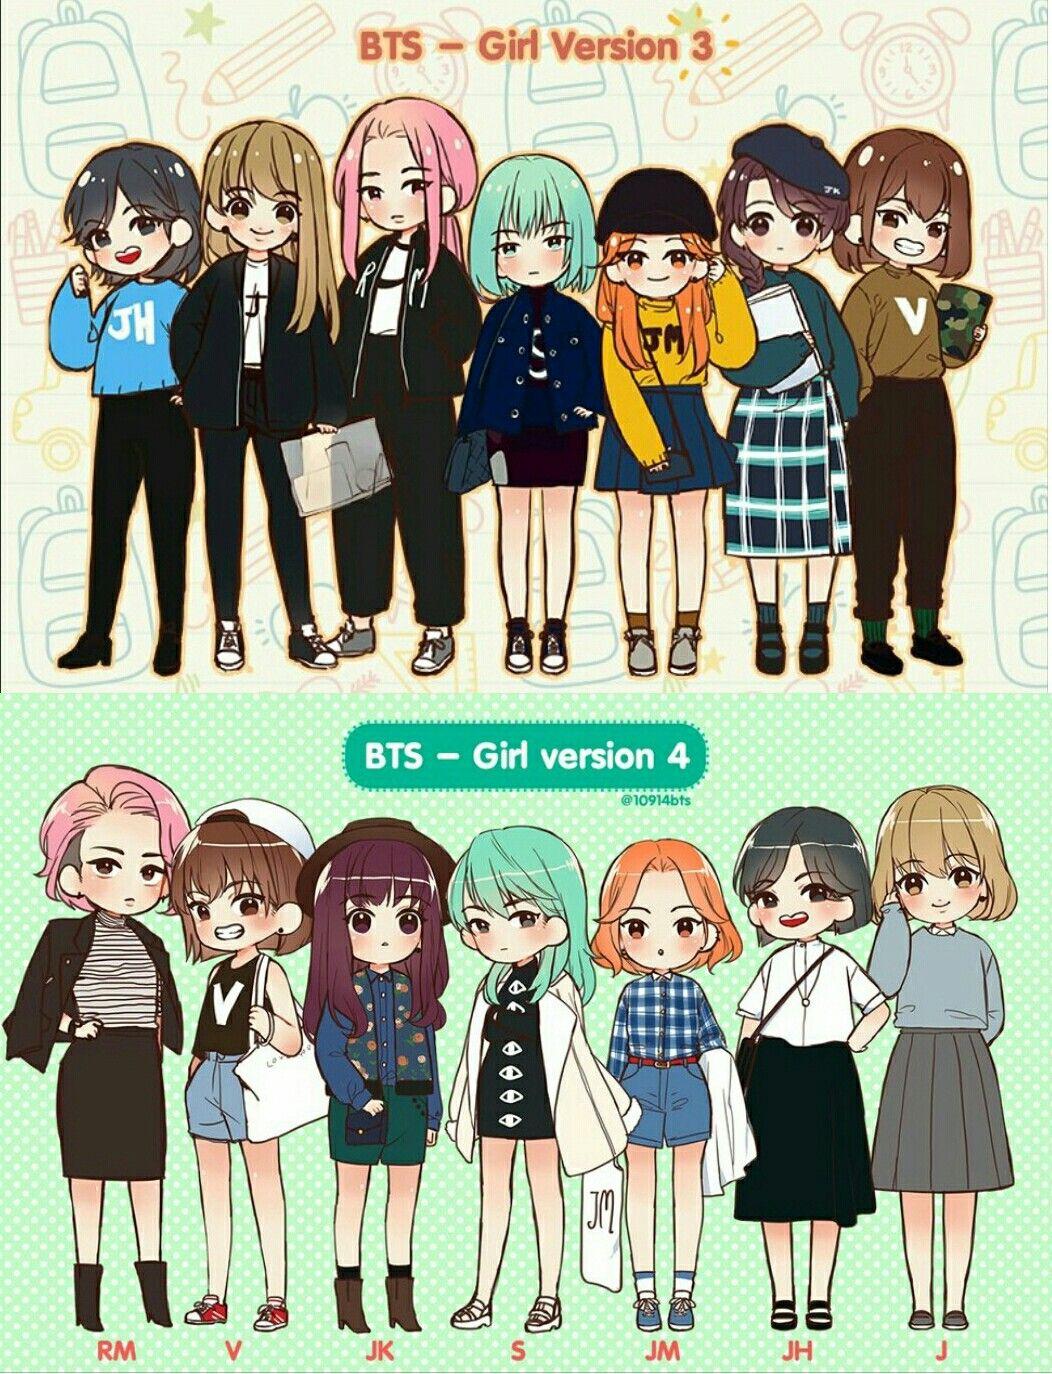 Bts Girl Version 3 & 4 Bts GirlVersion ♡BTS